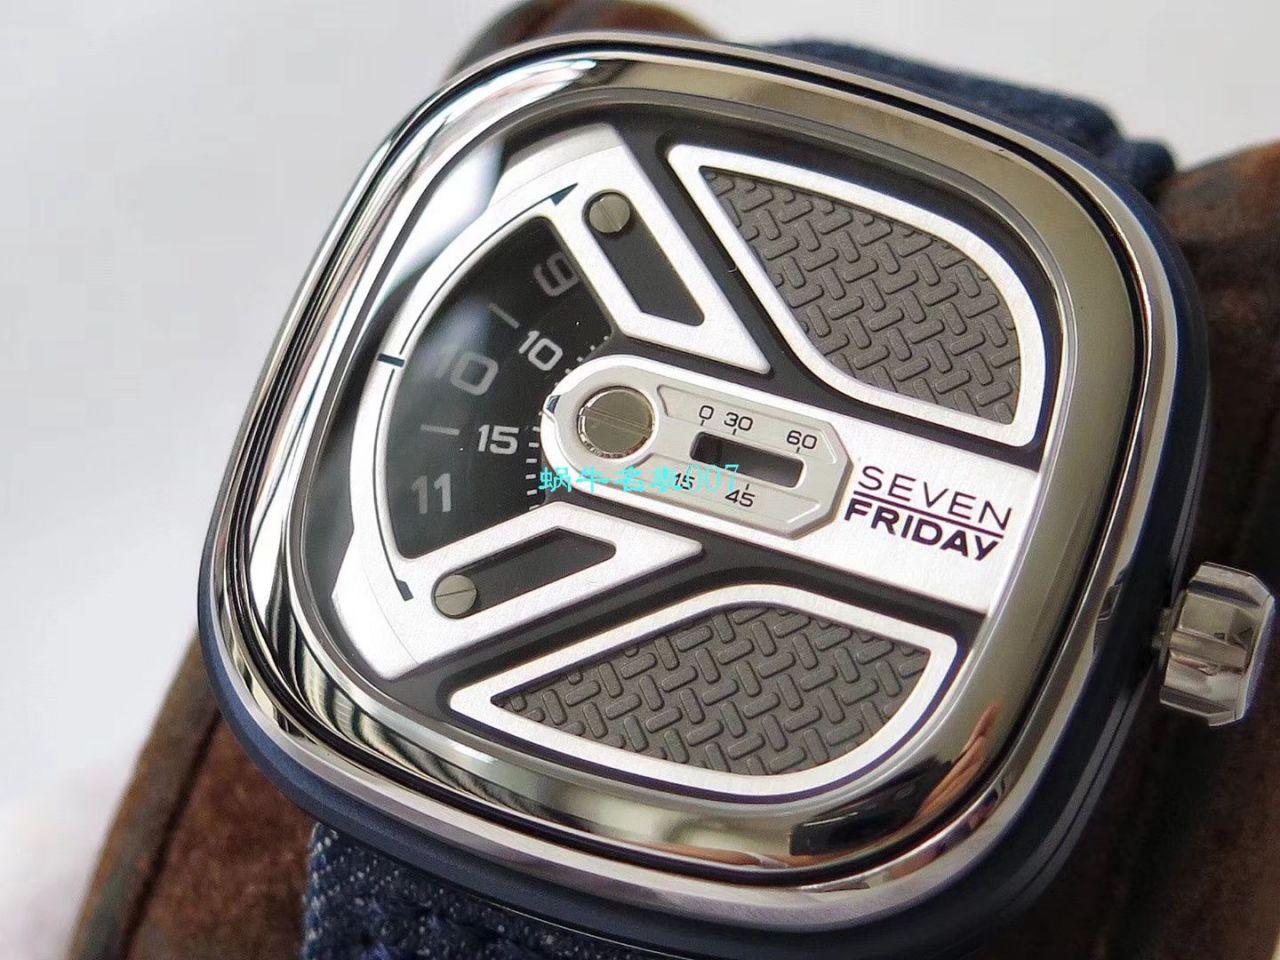 【SV厂顶级复刻手表】Seven Friday七个星期五 M1B/01 男士时尚机械腕表